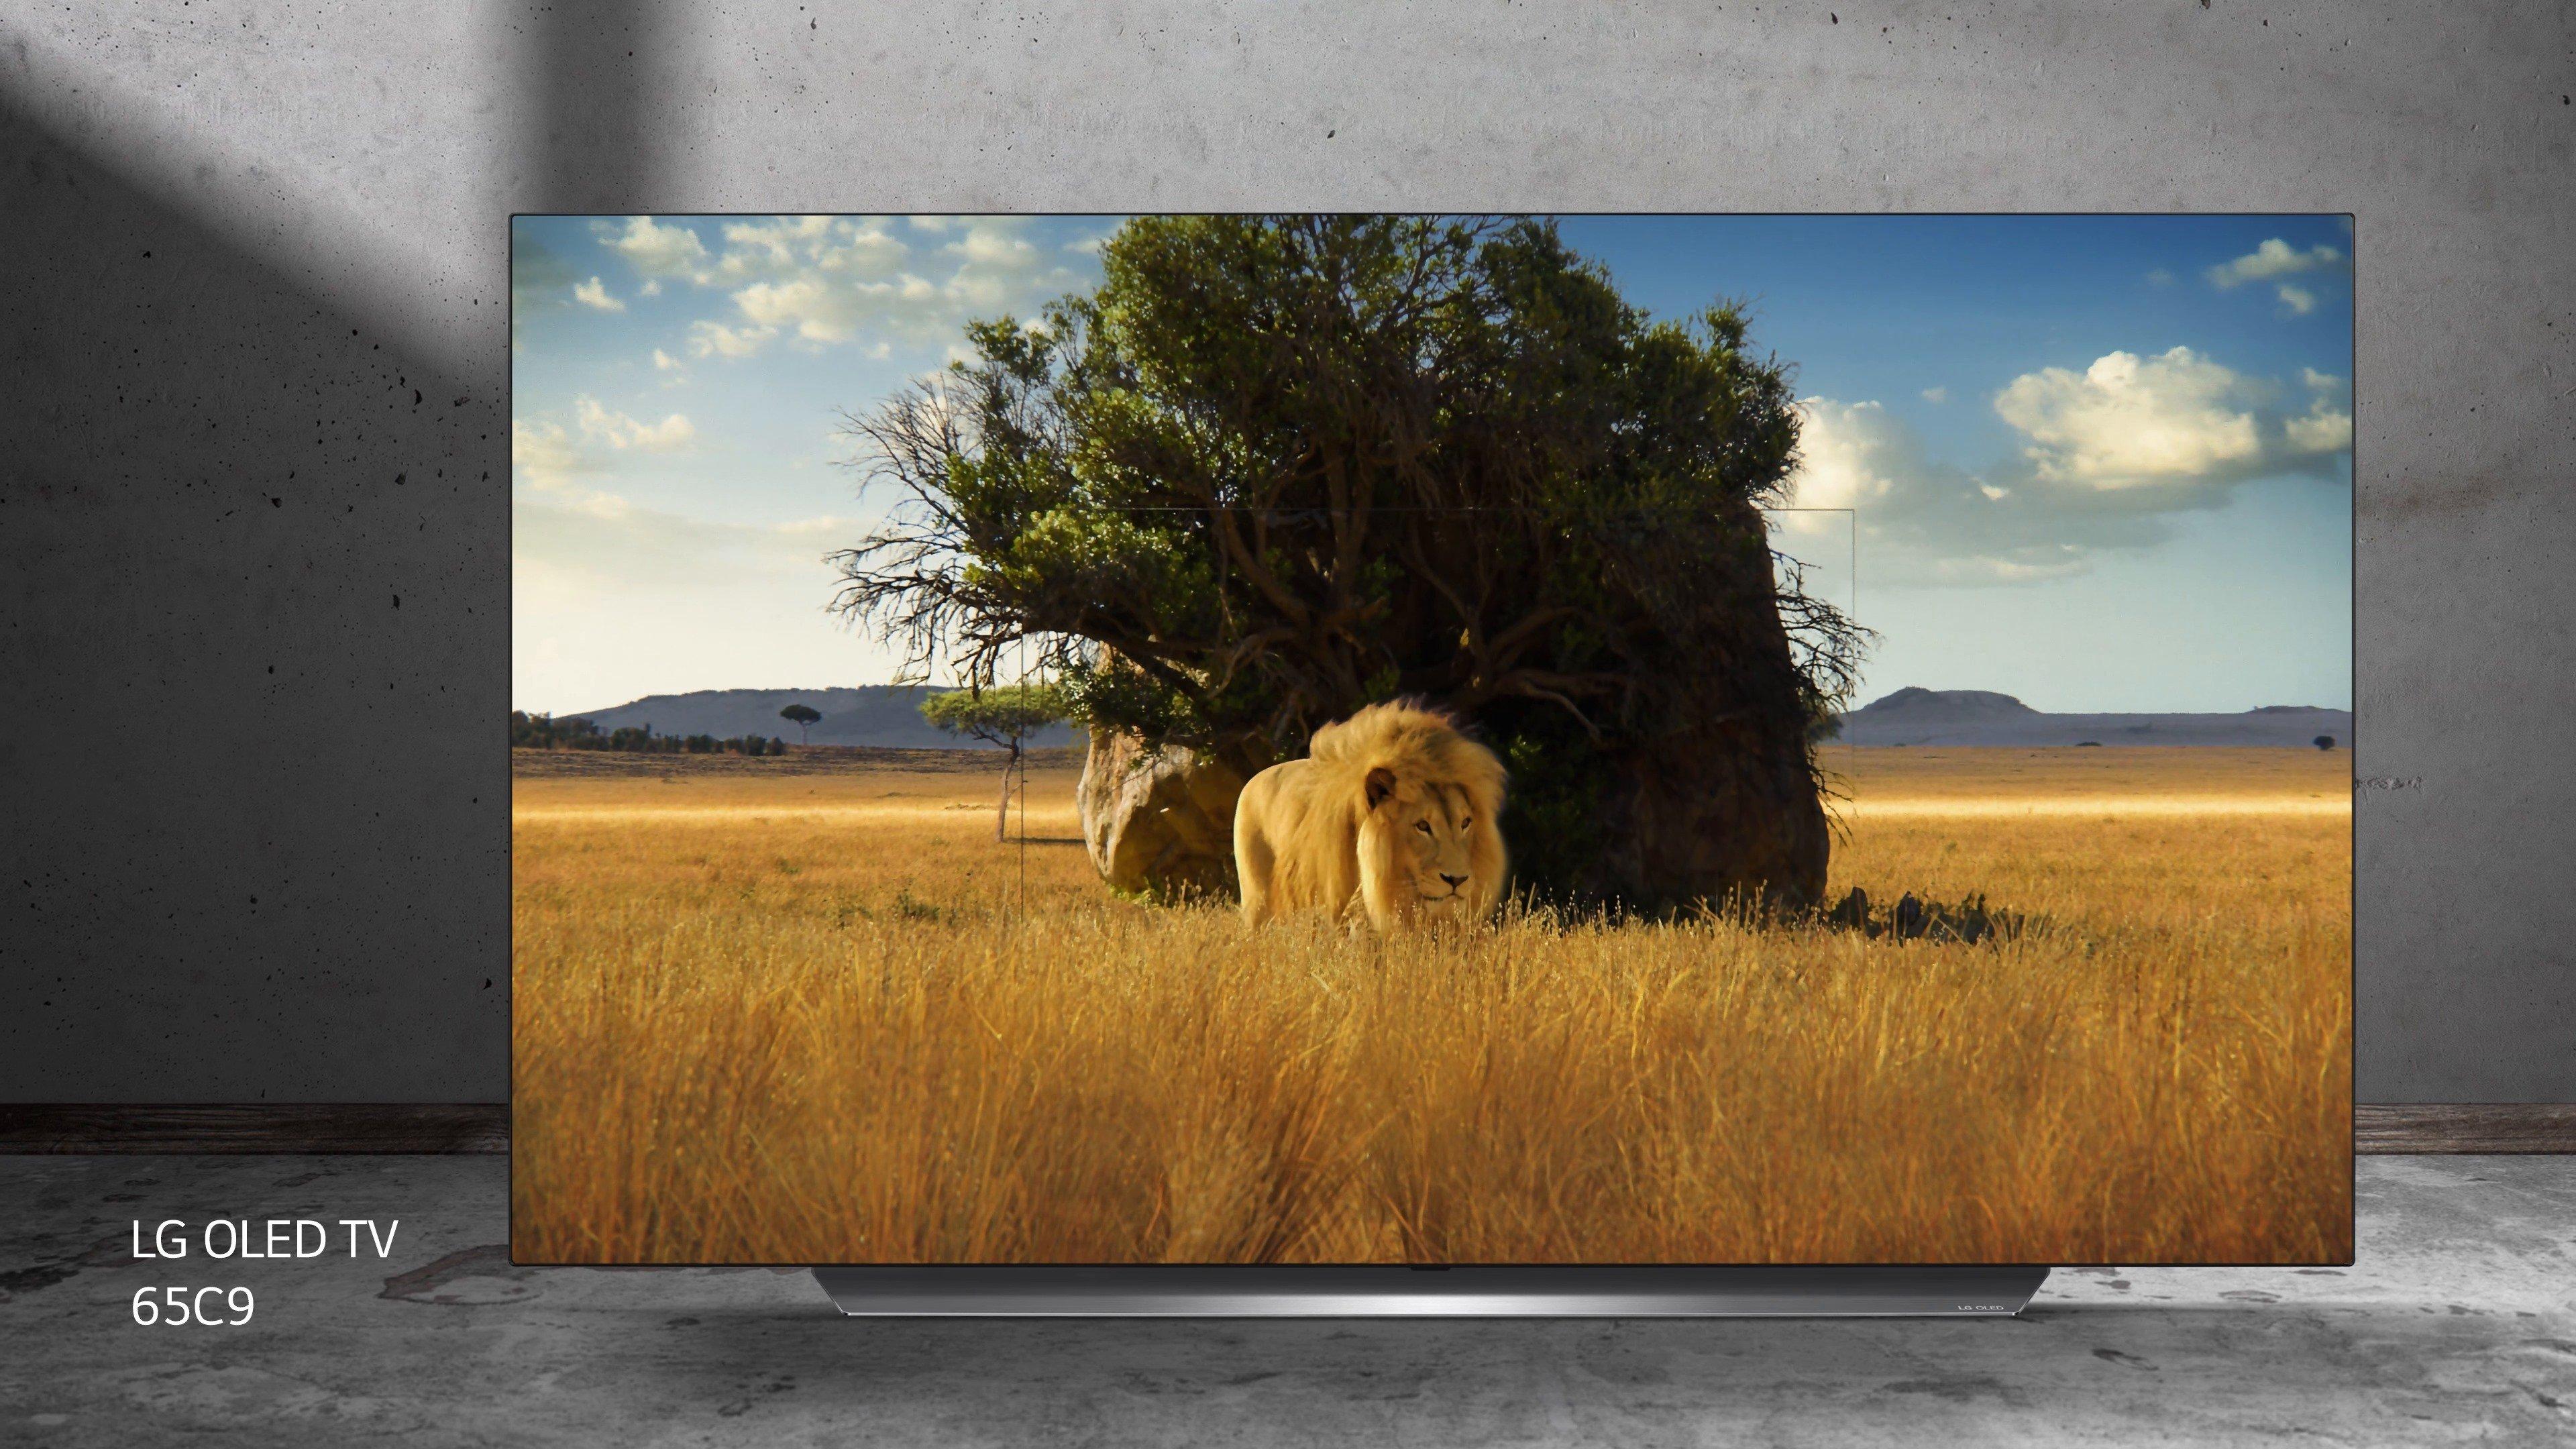 LG OLED TV – perfektes Schwarz, perfekte Farben ansehen